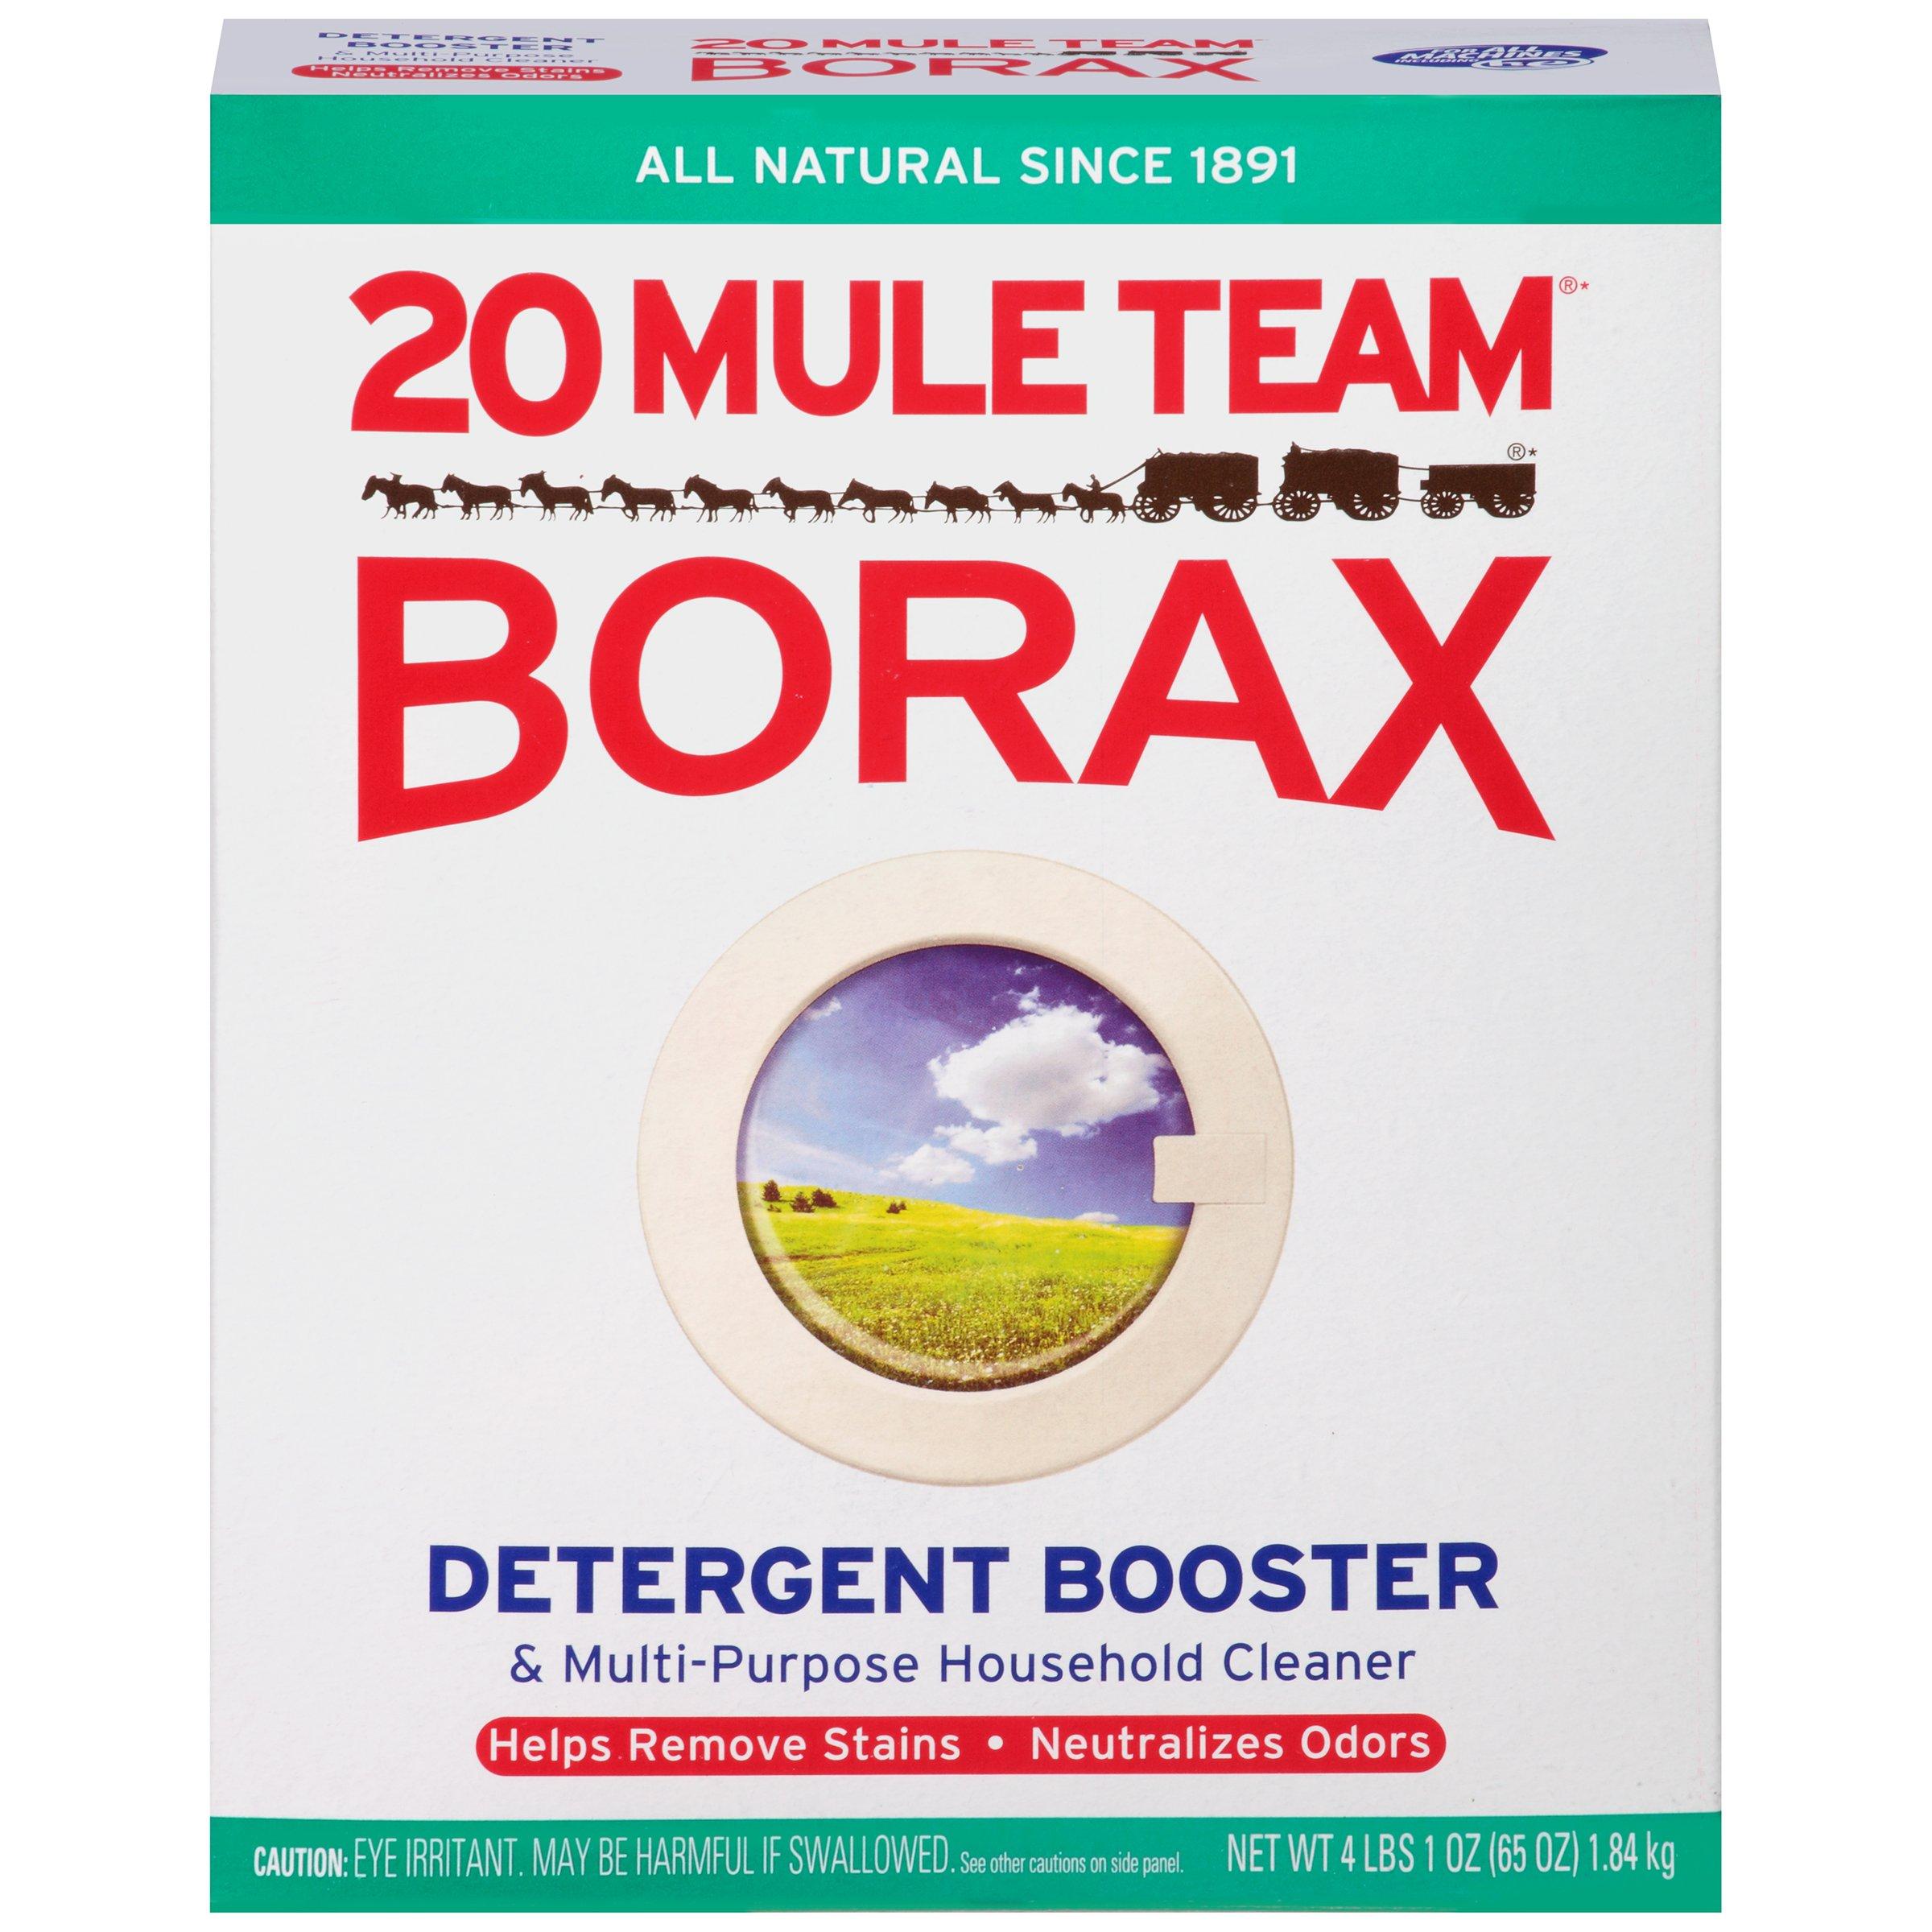 Borax 20 Mule Team Detergent Booster & Multi-Purpose Household Cleaner Box, 65 Oz (1)